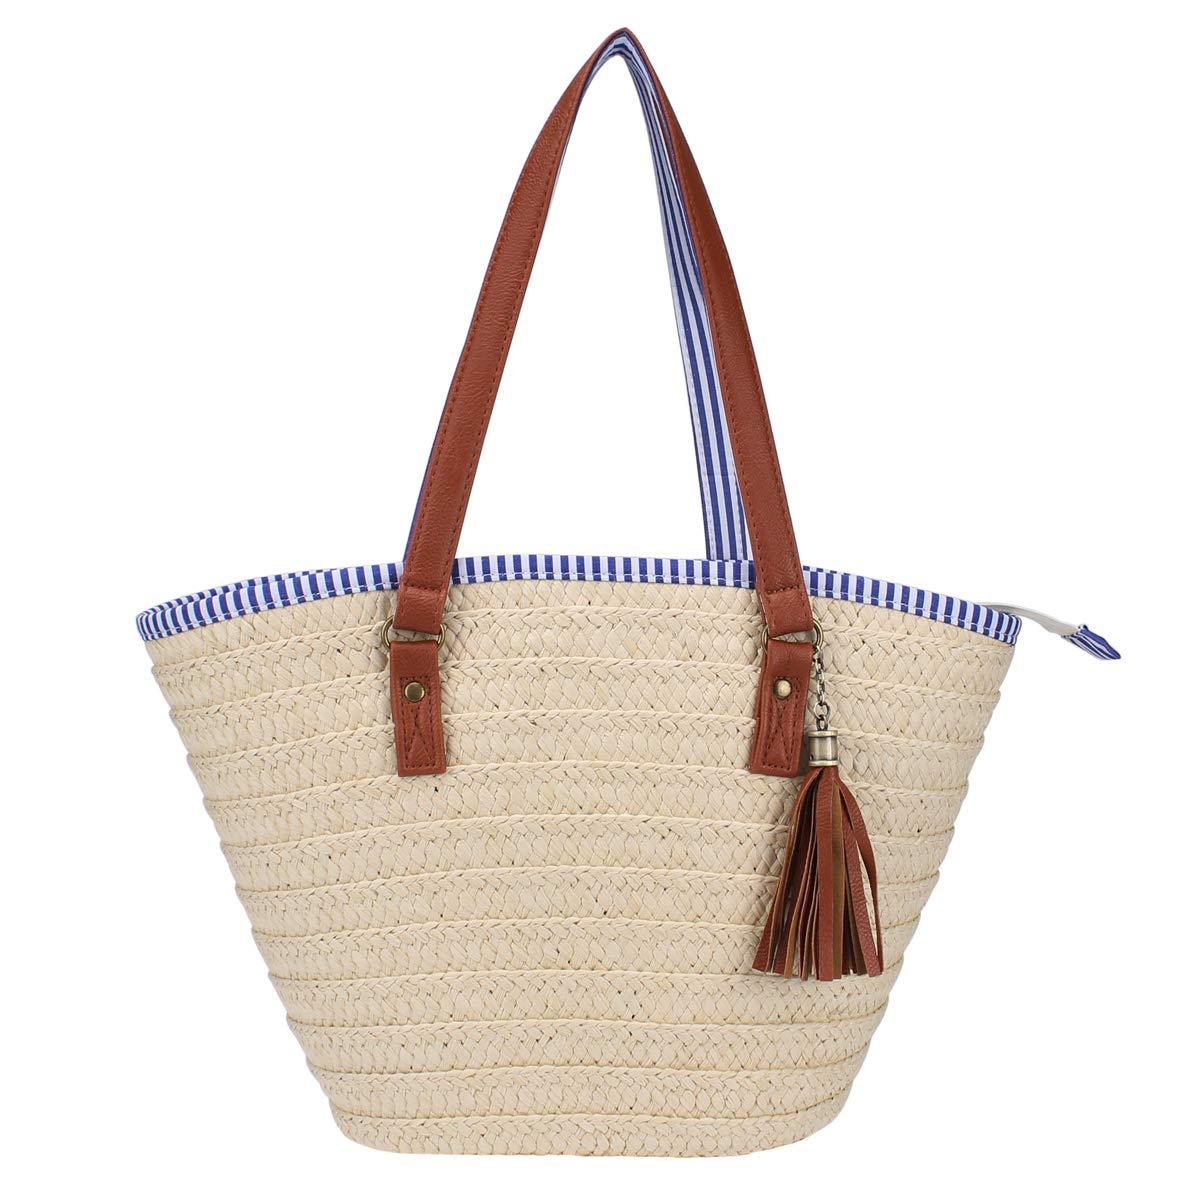 Sornean Summer Straw Beach Bag Handbags Shoulder Bag Tote,cotton lining,Top Leather Handle-Eco Friendly (Off white Medium)